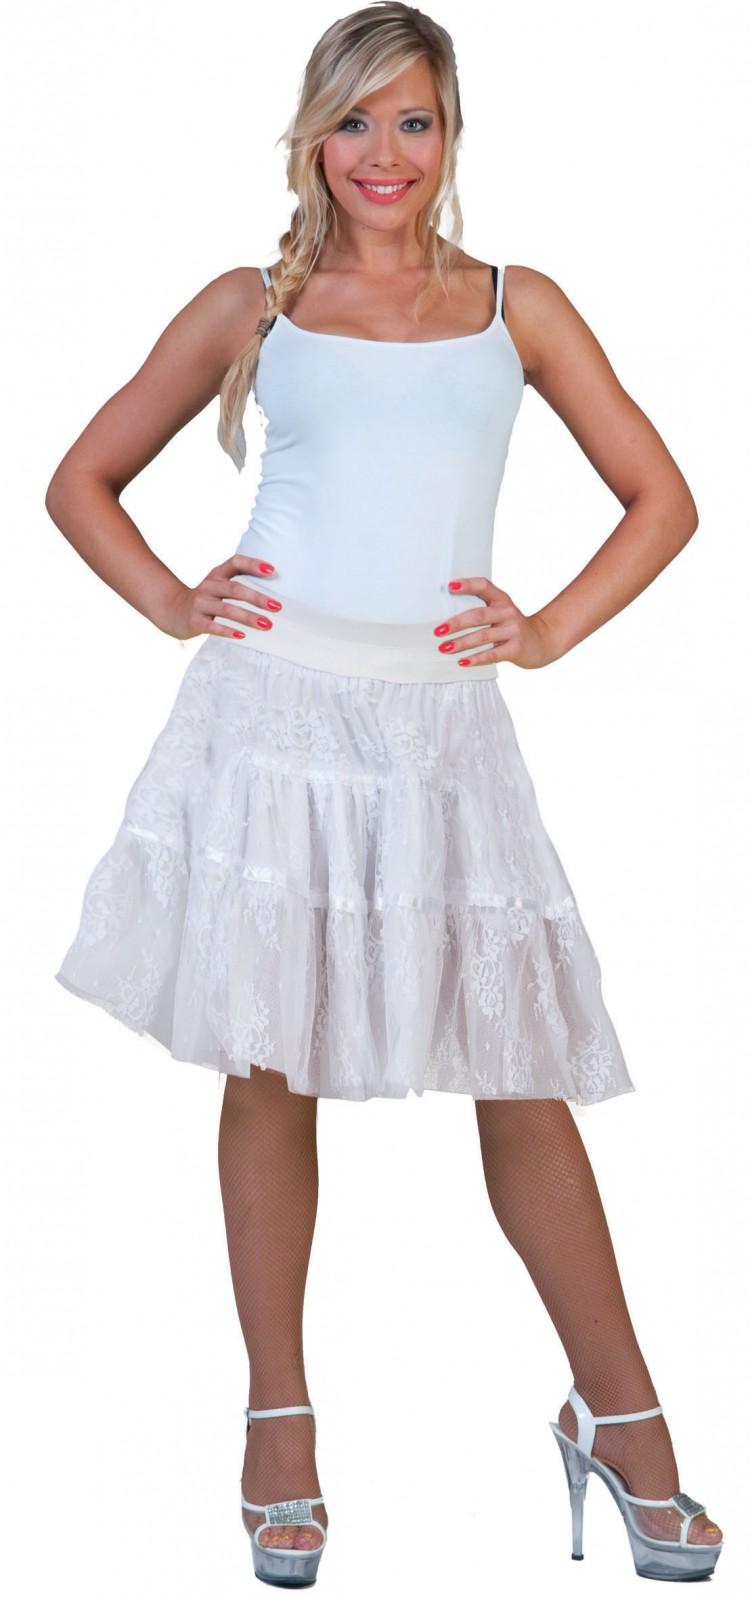 Kostum Tullrock Petticoat Spitzen Rock Schwarz Od Weiss Karneval